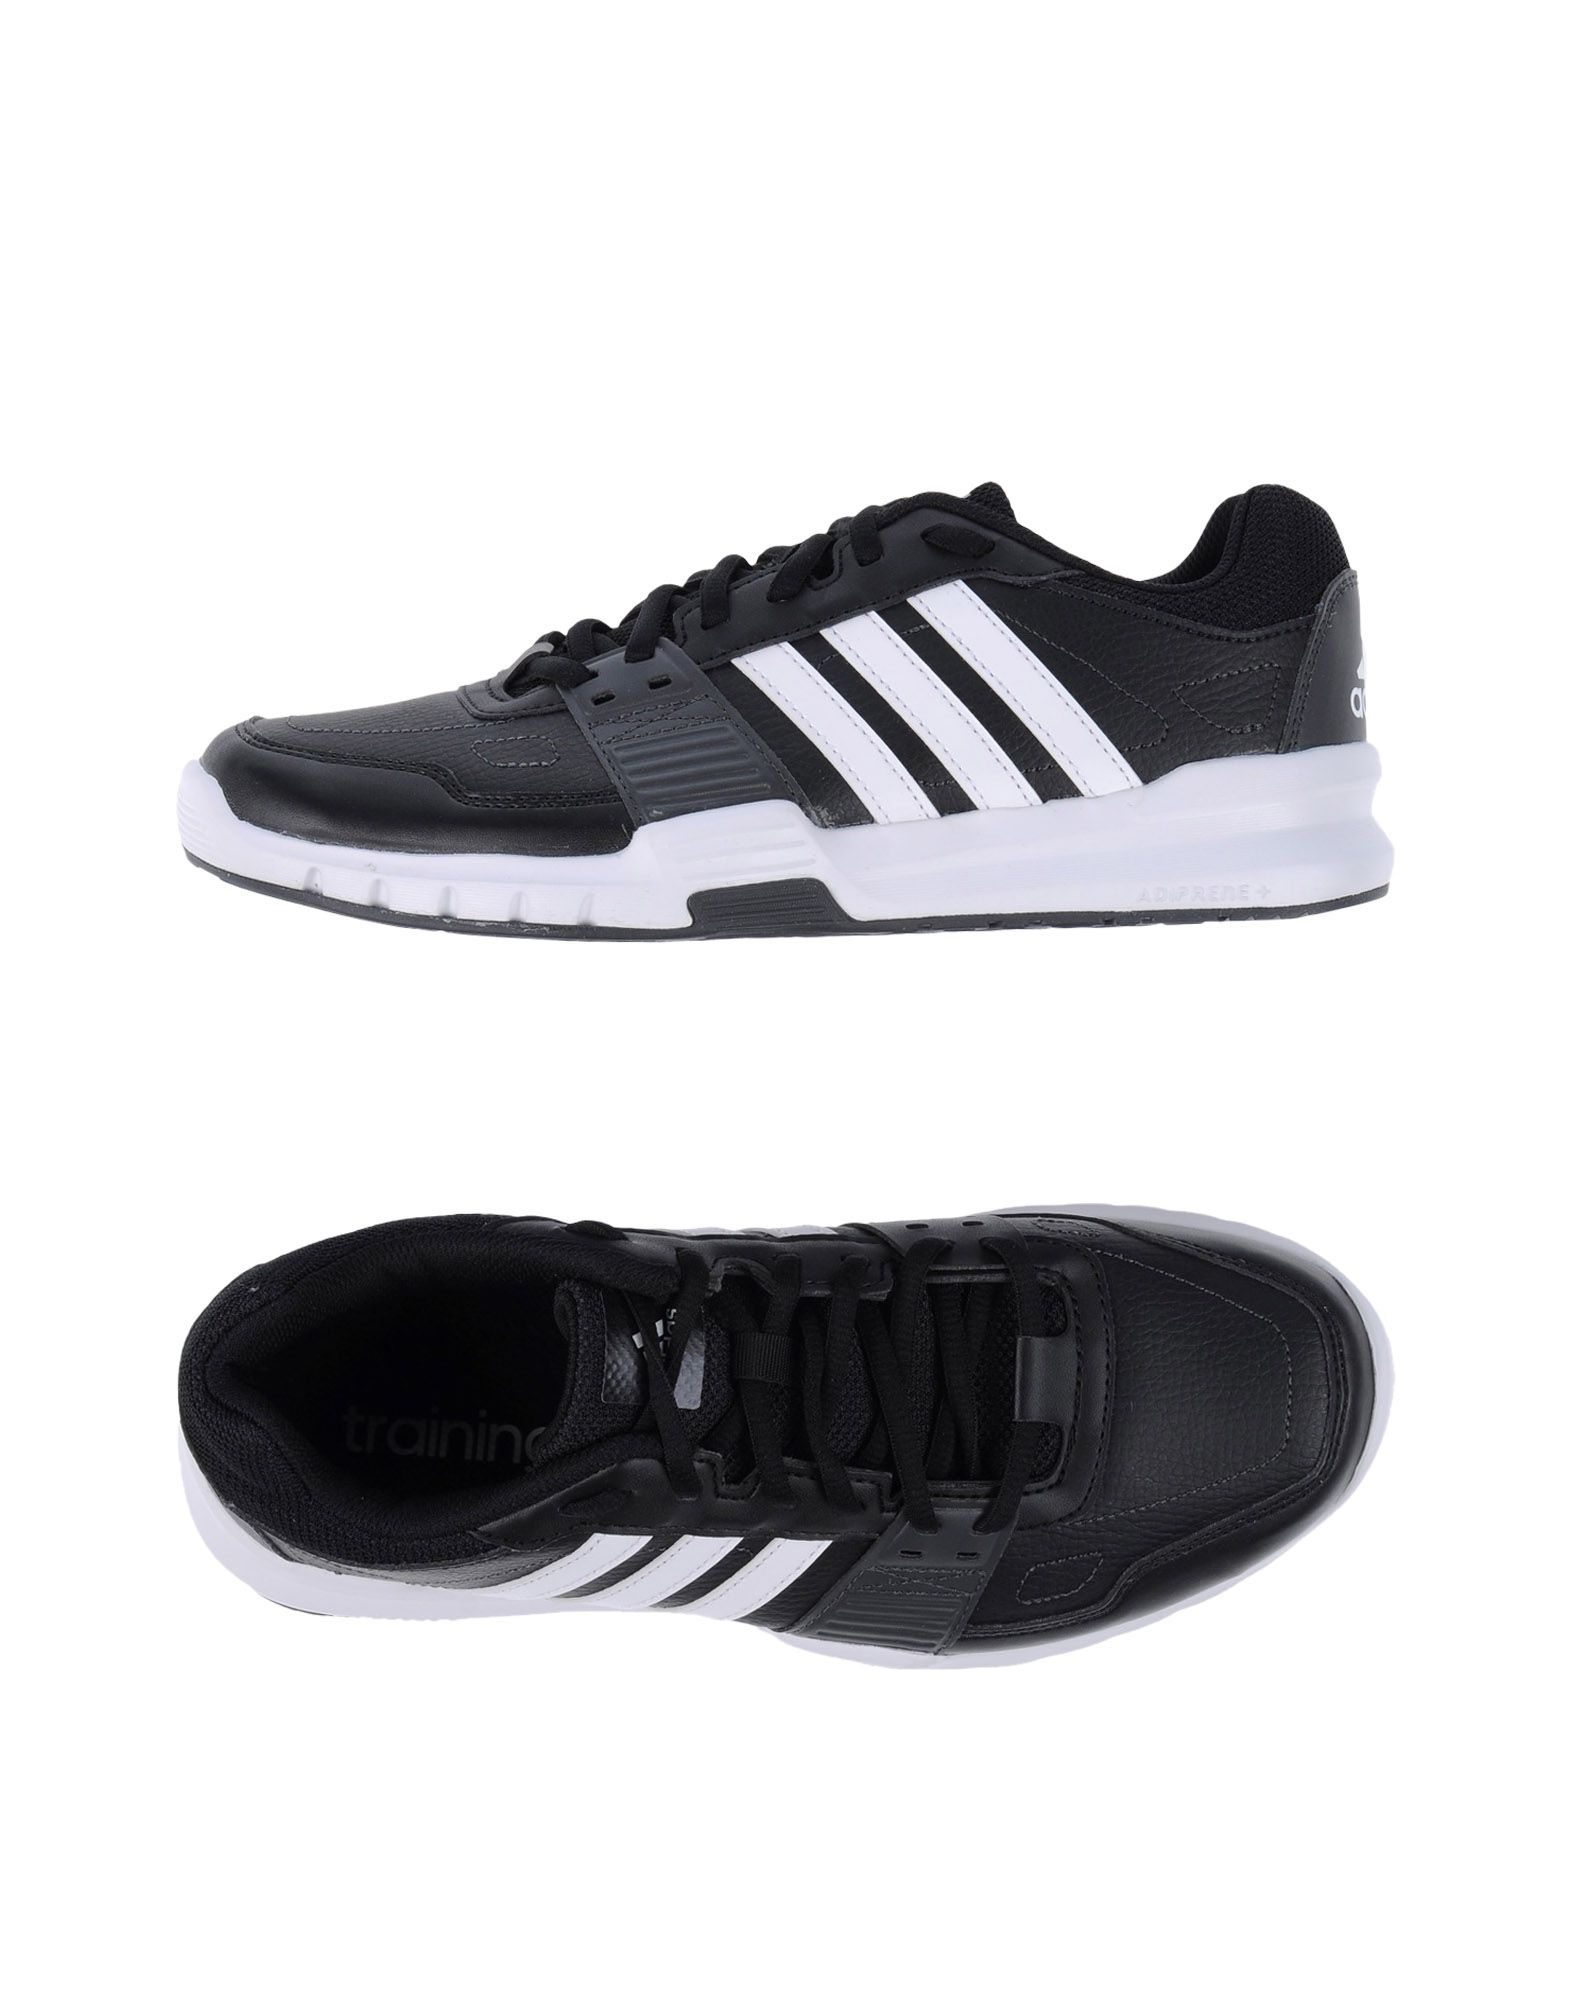 Adidas Sneakers Herren  11135399QC Gute Qualität beliebte Schuhe